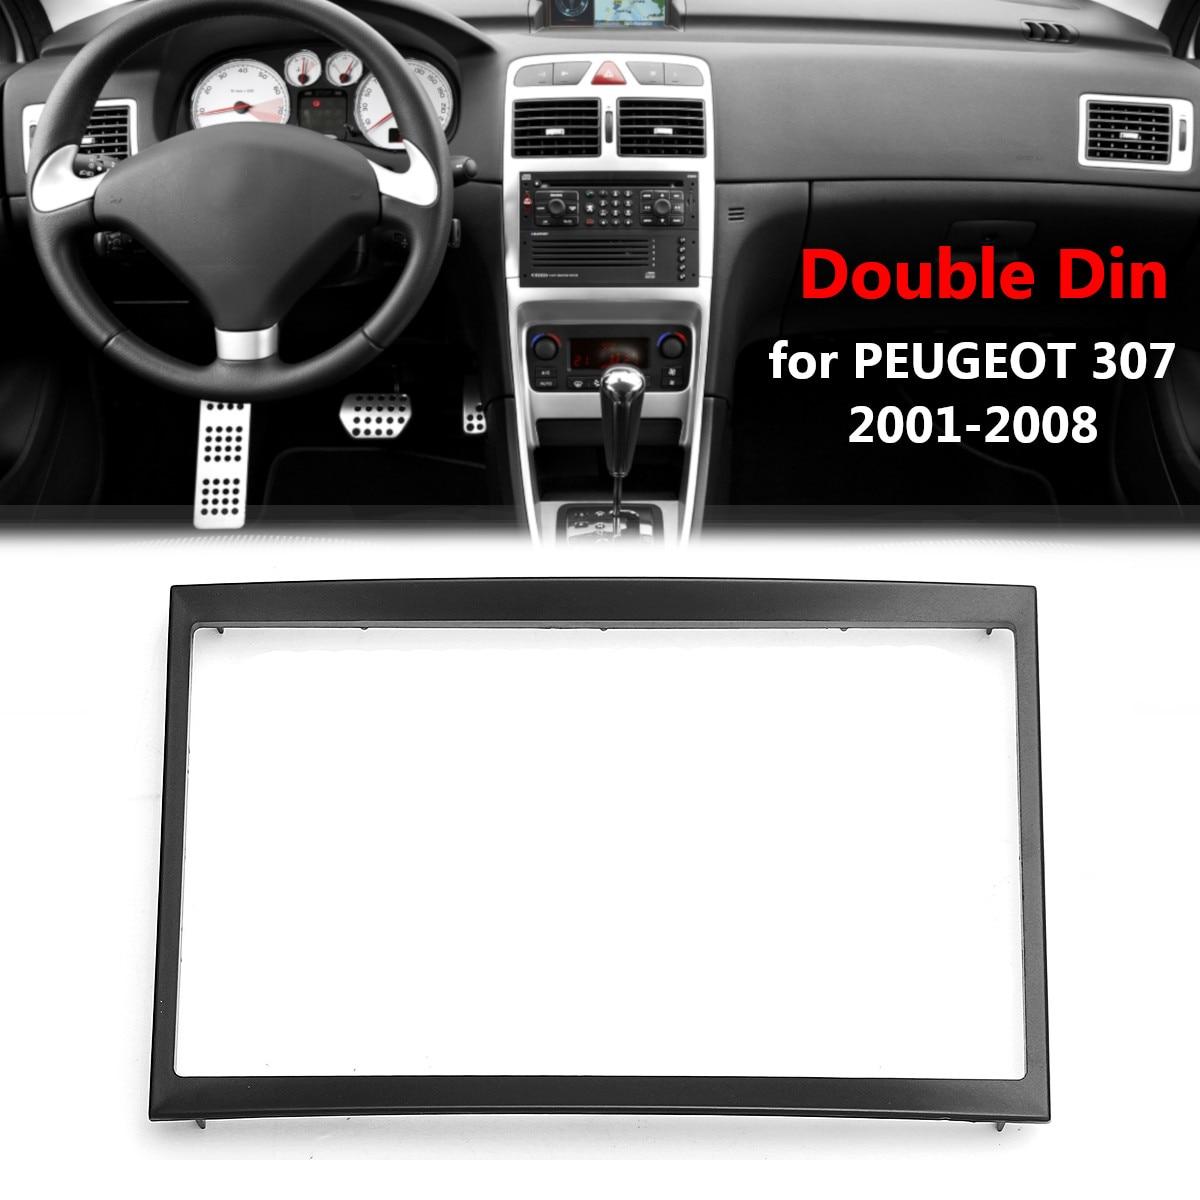 Auto Auto 2 Din CD Trim Dash Mount Kit Stereo Radio Fascia Panel Platte Rahmen Adapter für Peugeot 307 2001 -2008